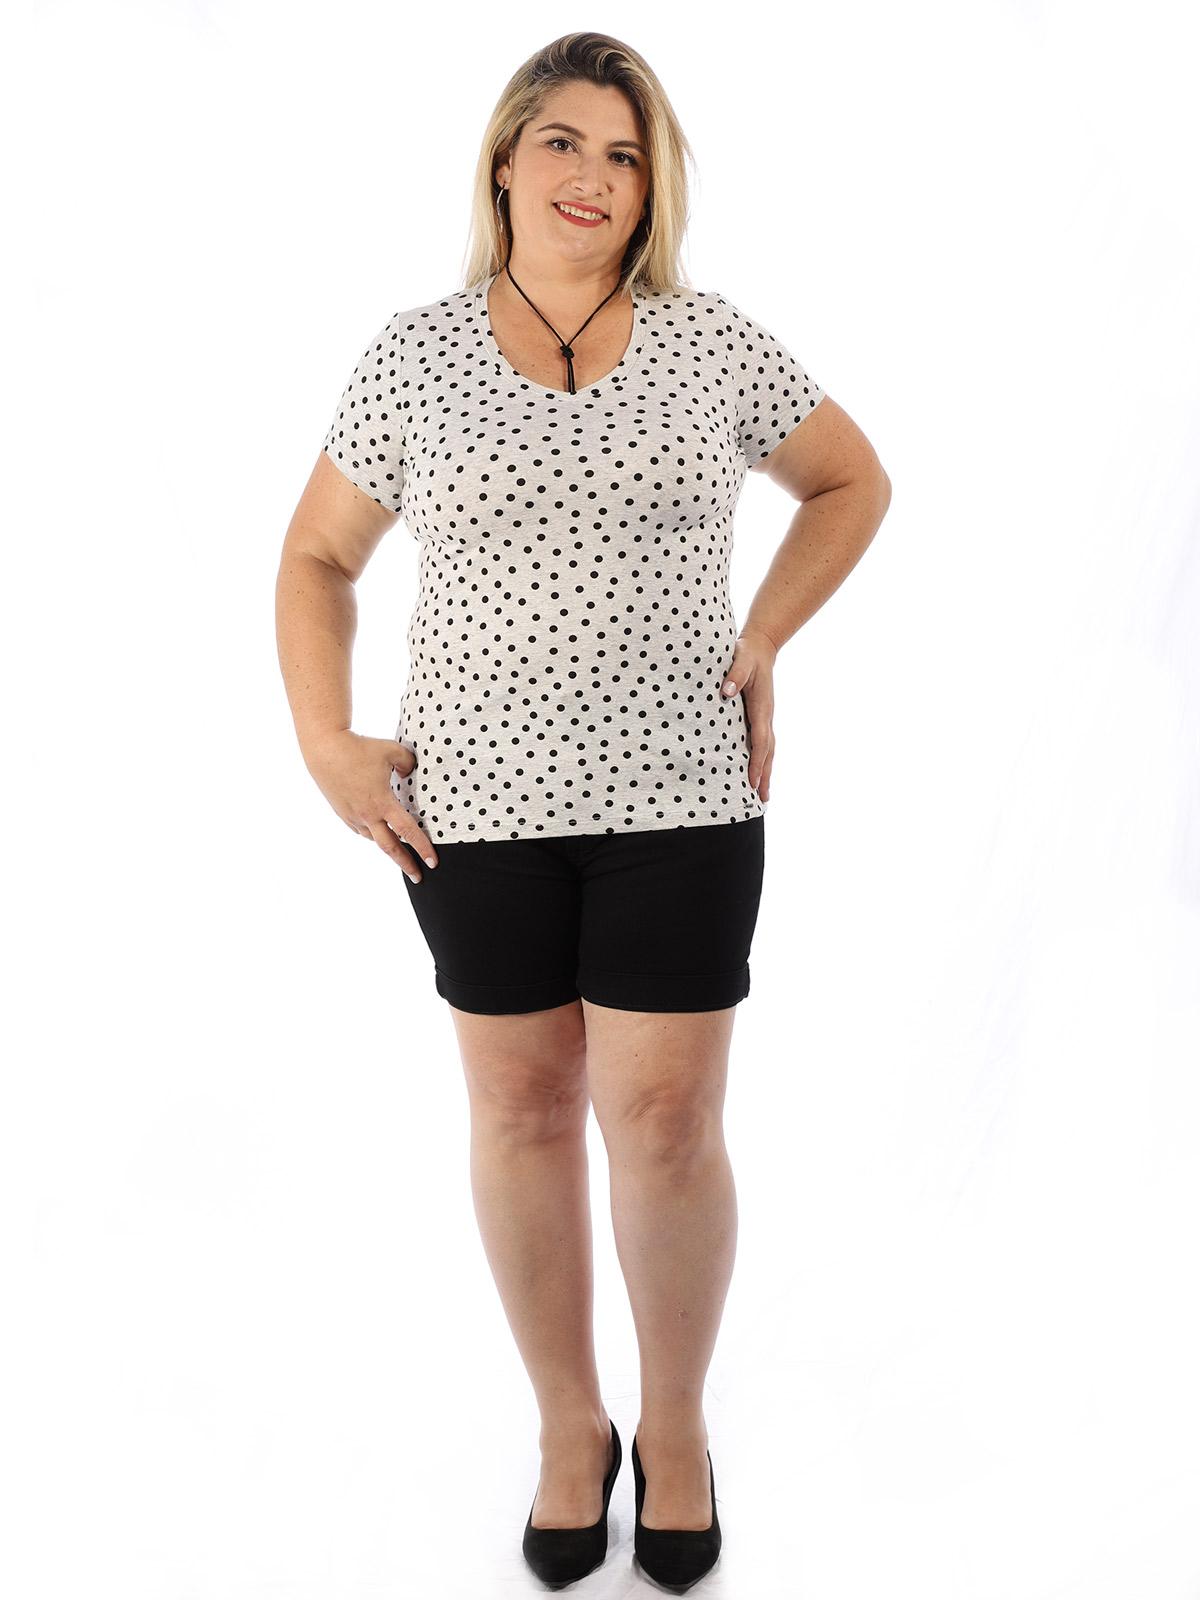 Blusa Plus Size Feminina Decote V. Estampada Mescla